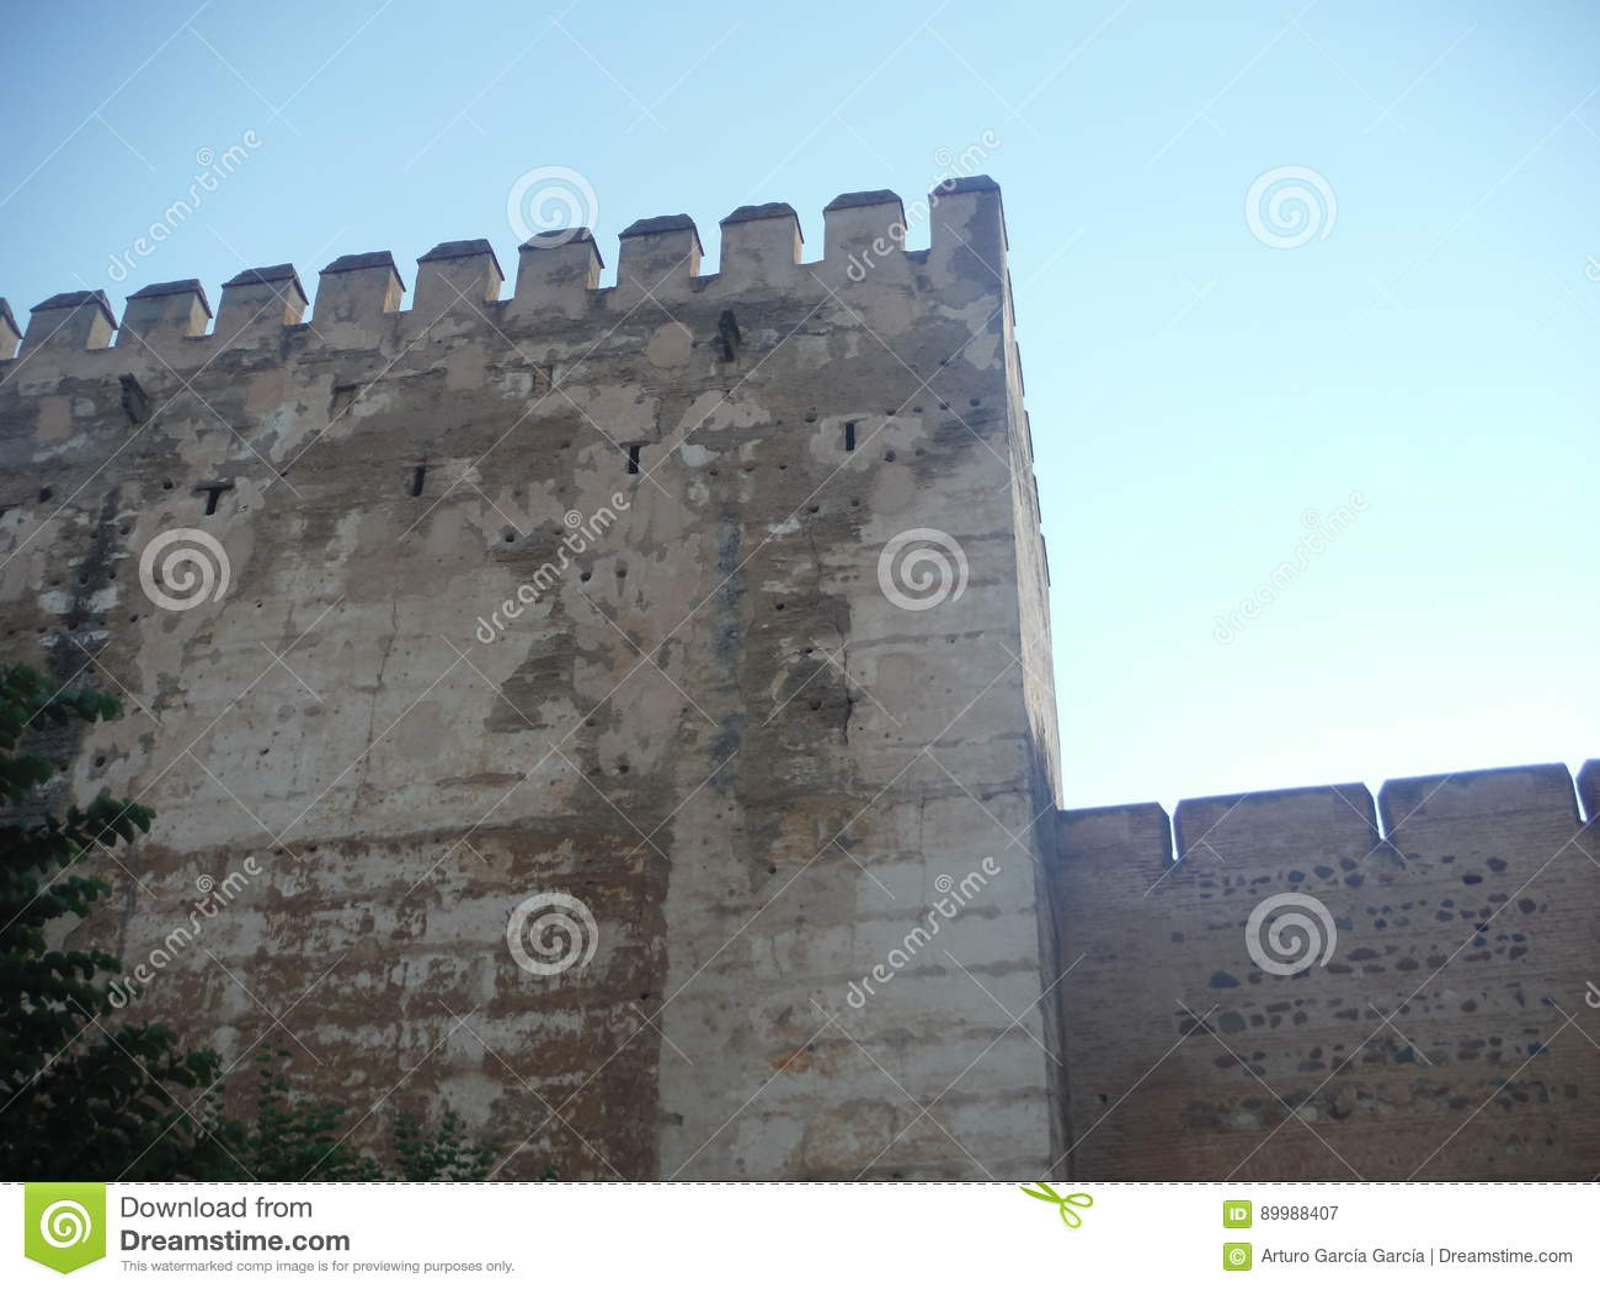 Torre de la alhambra, Granada